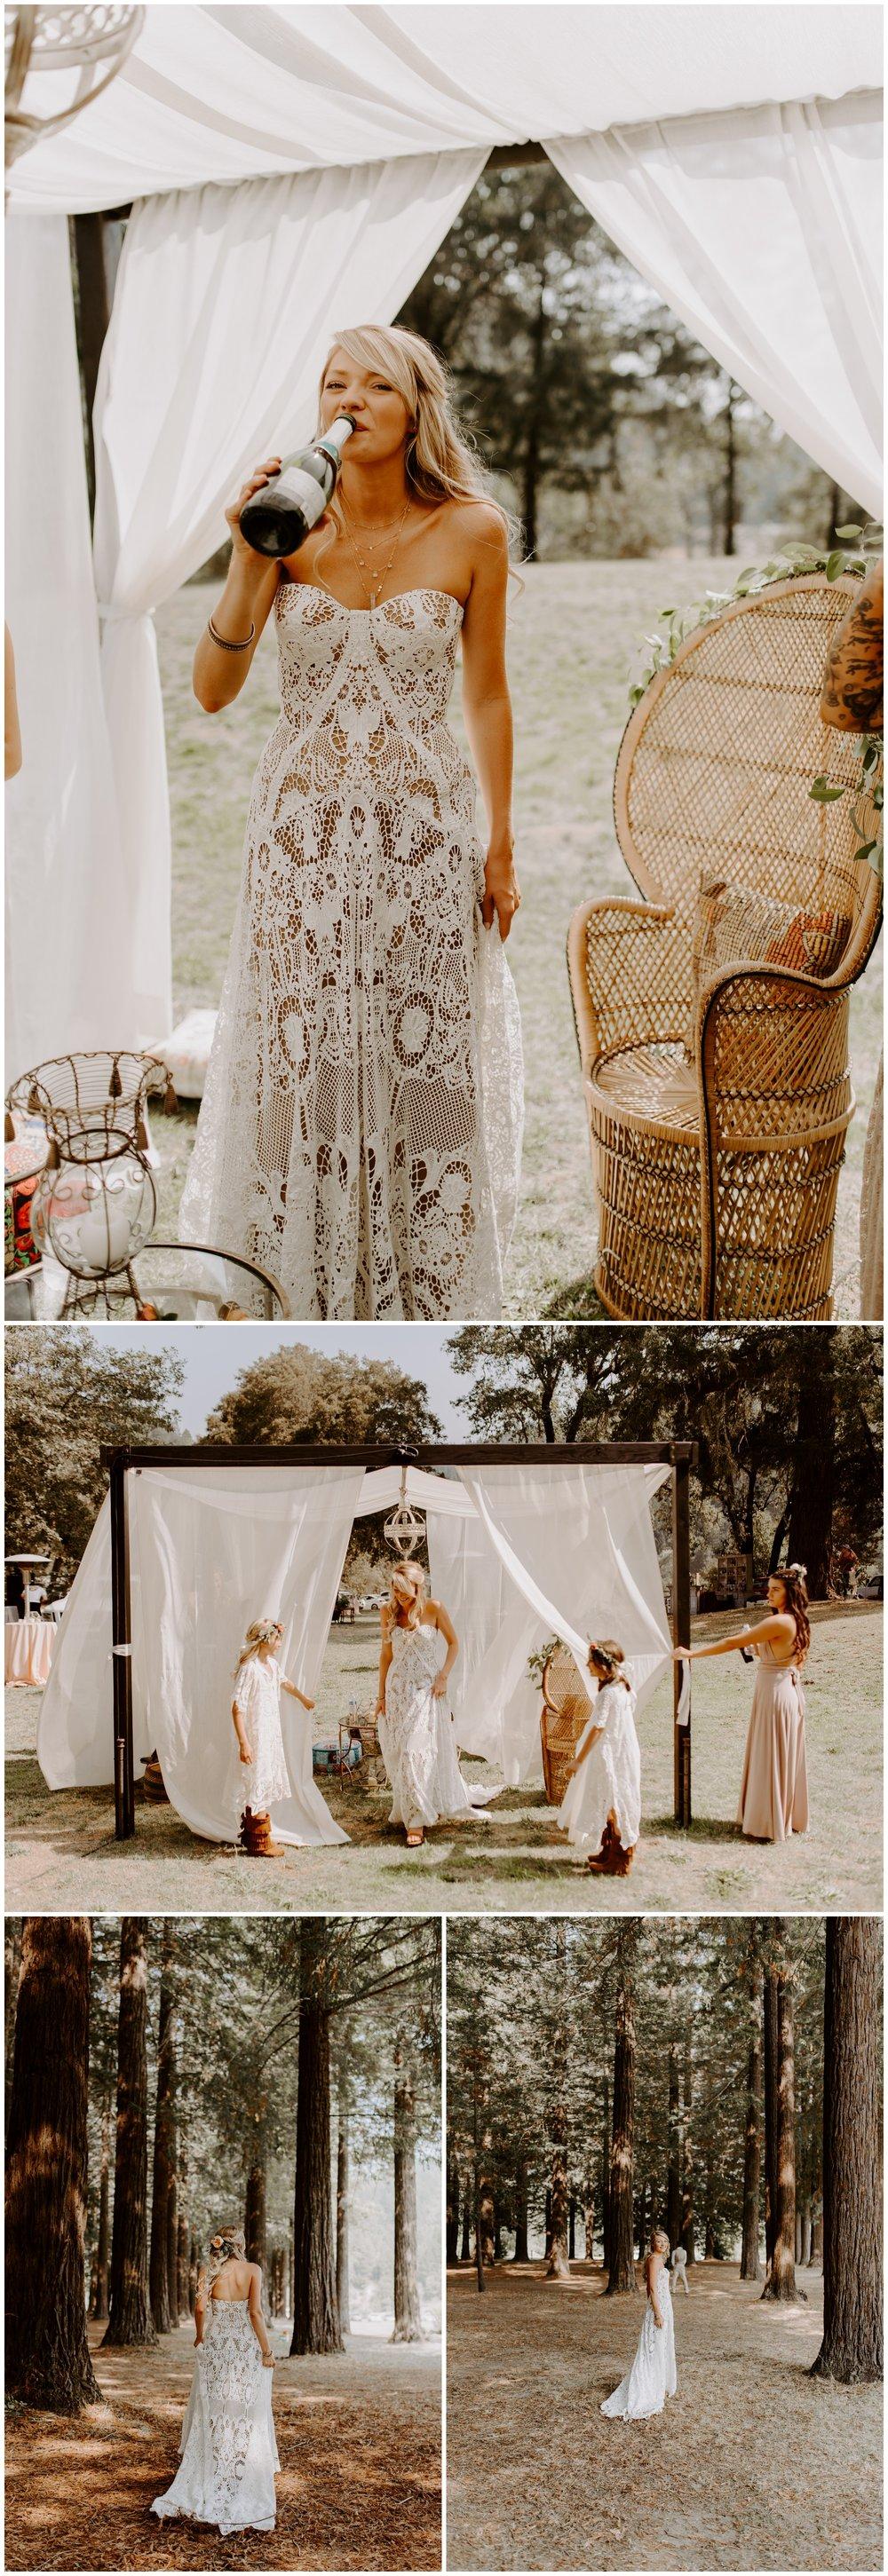 Redwood Festival Wedding Humbolt California - Jessica Heron Images_0010.jpg